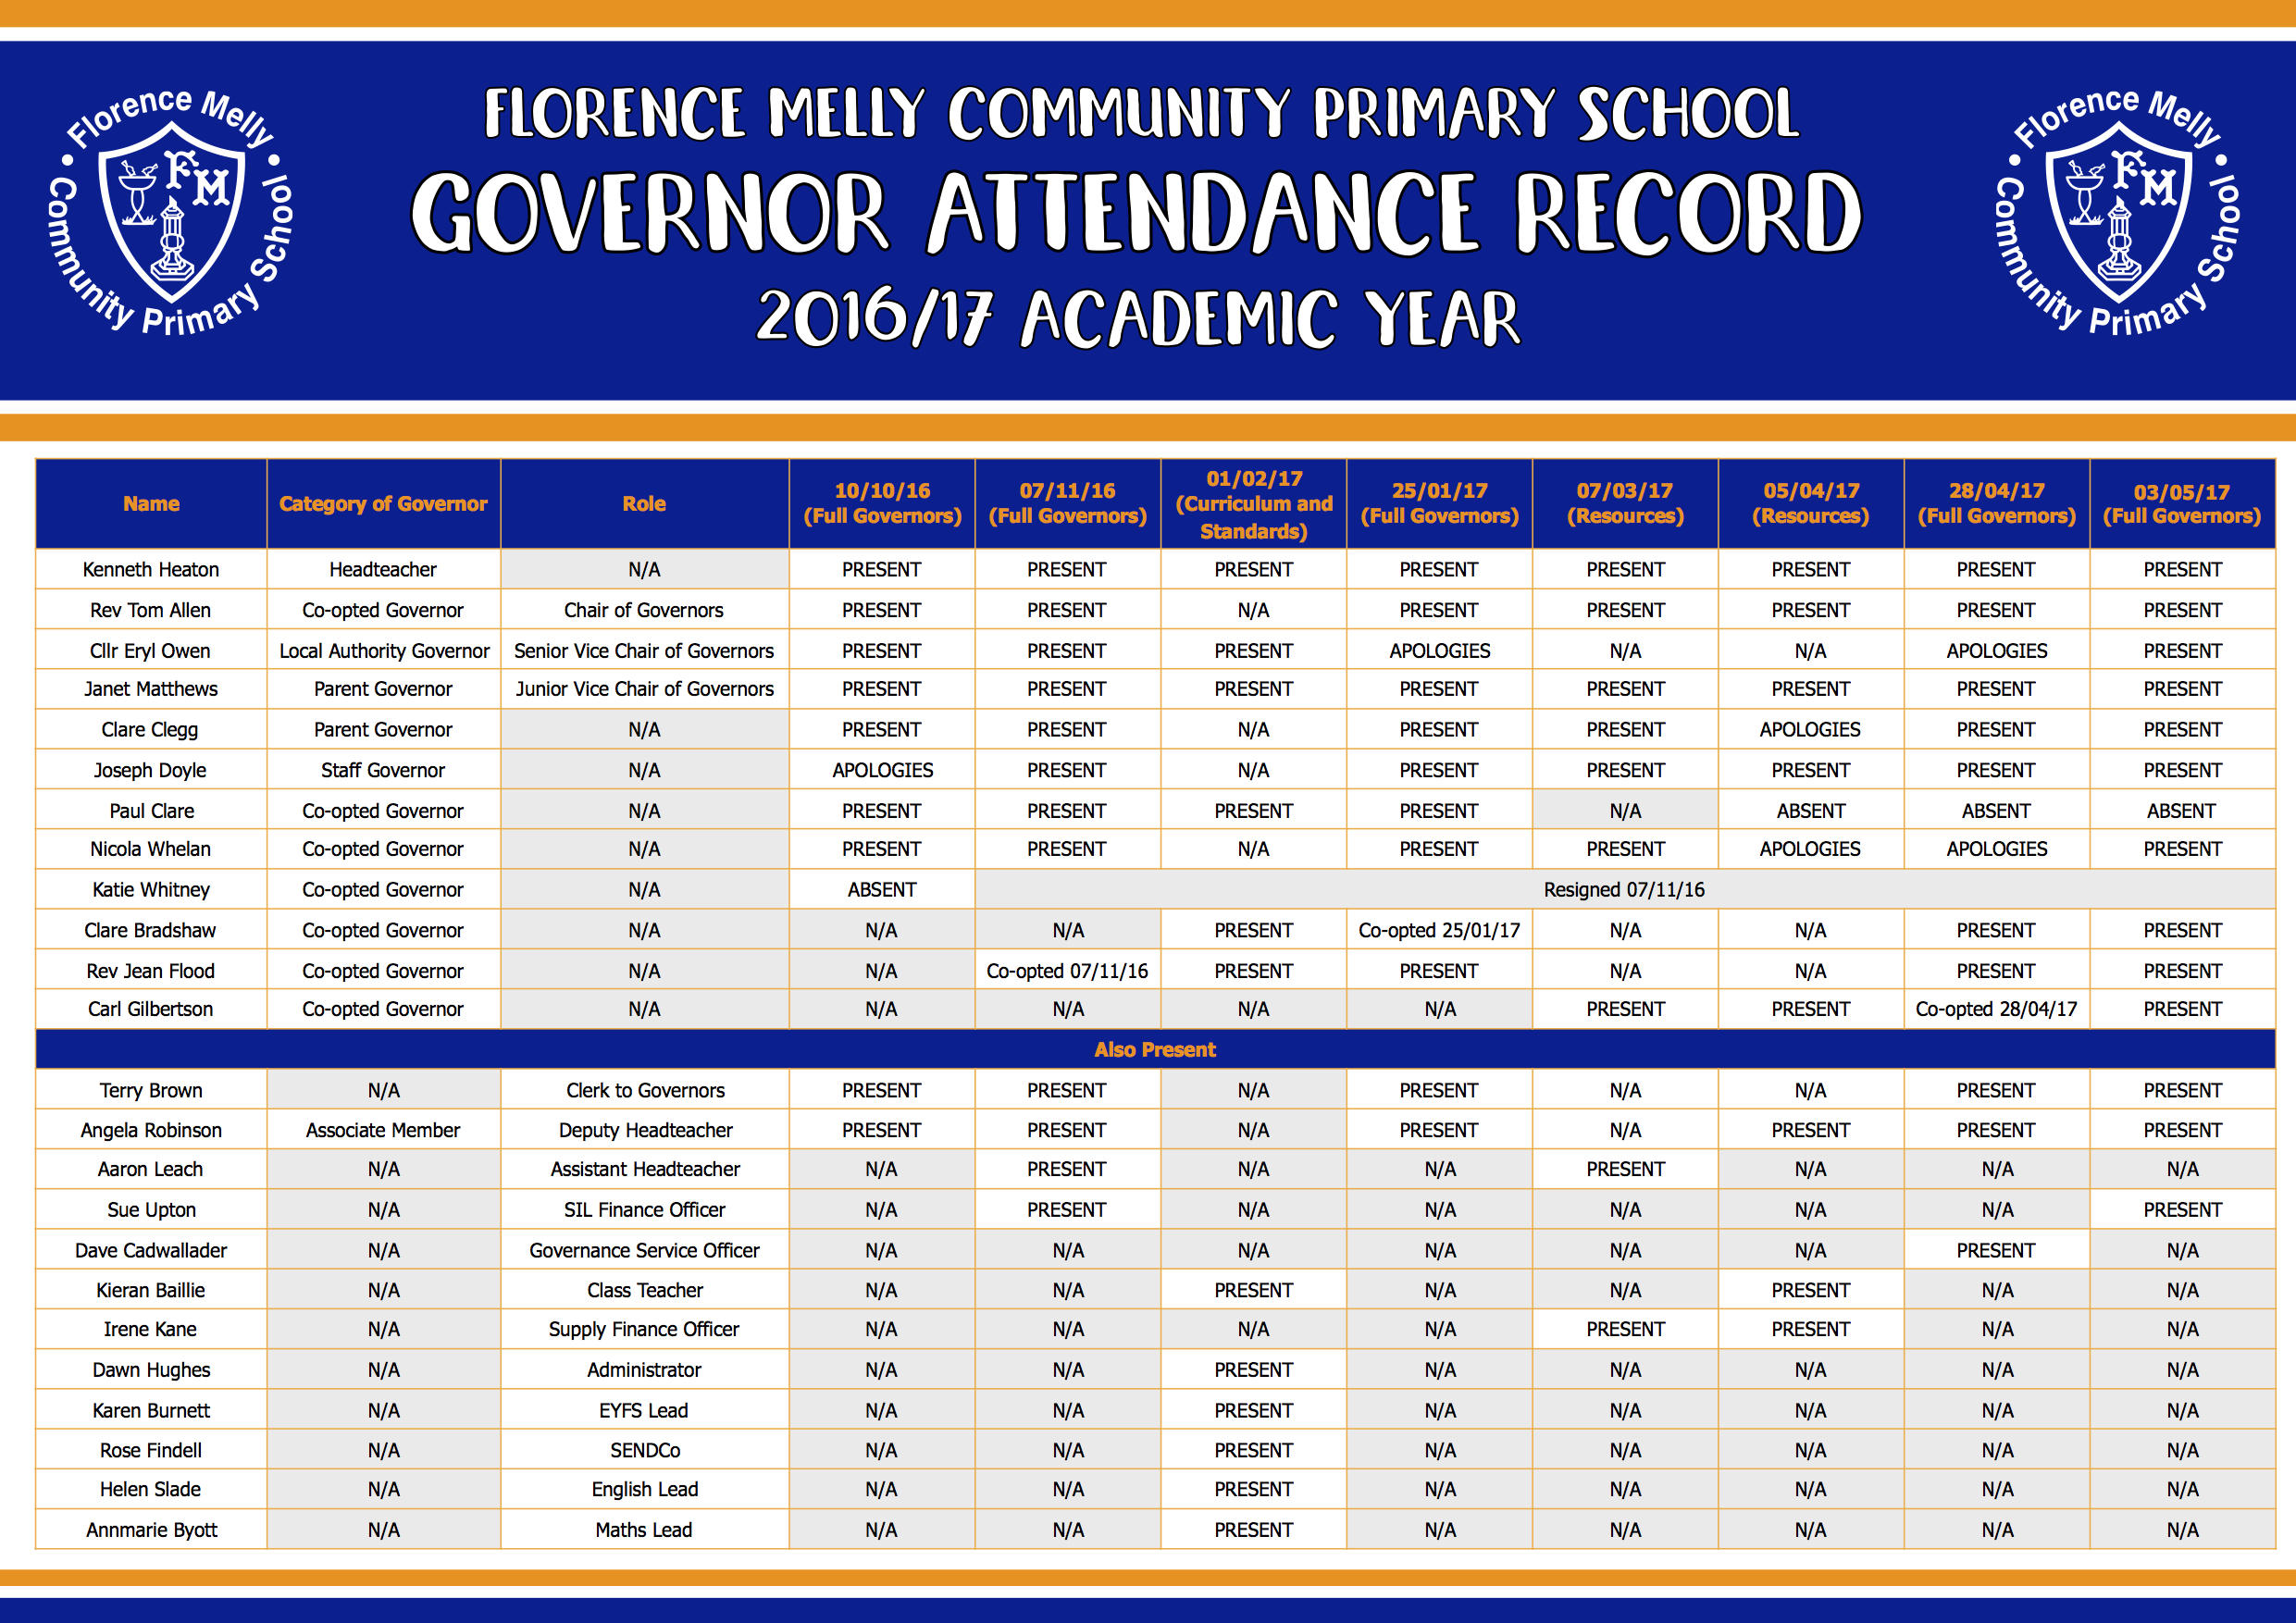 Governor Attendance Record 2016:17